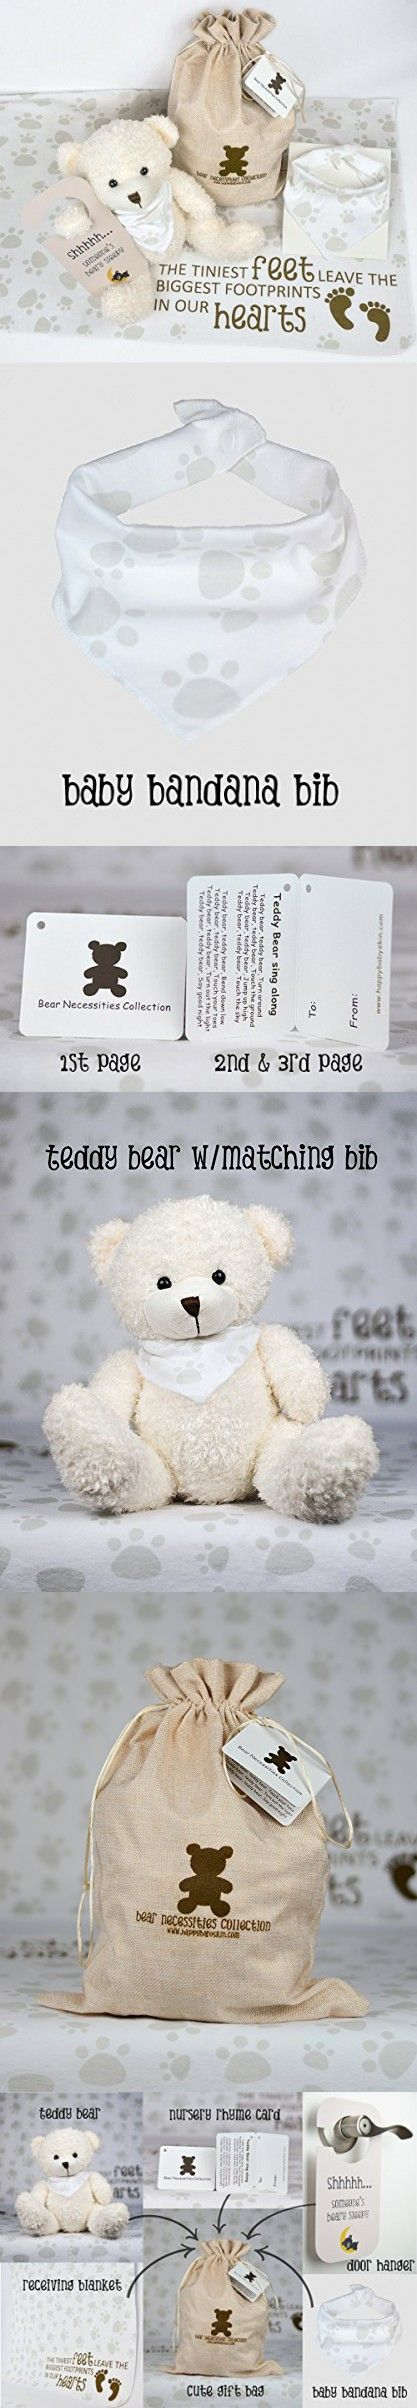 Baby Bear Gift Set including Baby Bandana Bib, Receiving Blanket, Plush Teddy Bear, Baby's Door Sign, and Bear Necessities Drawstring Bag from Happy Baby Skin